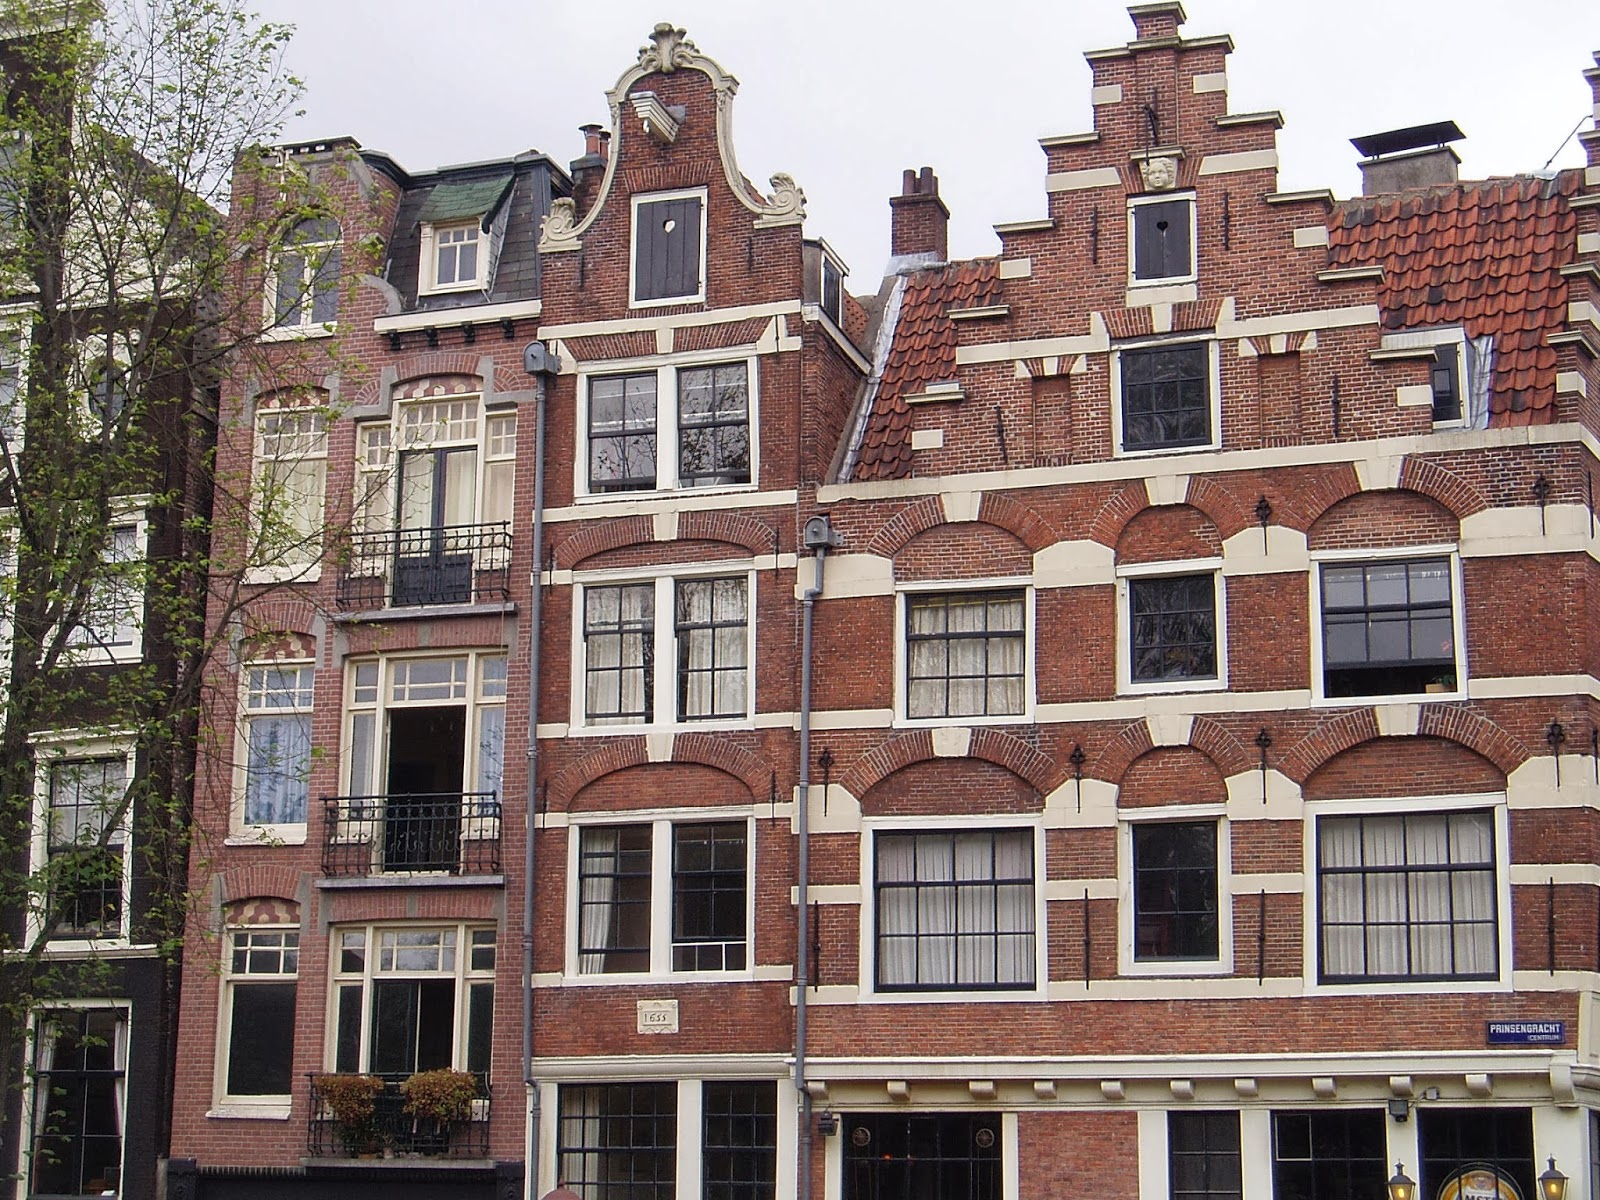 Viajar miradas for Casa amsterdam